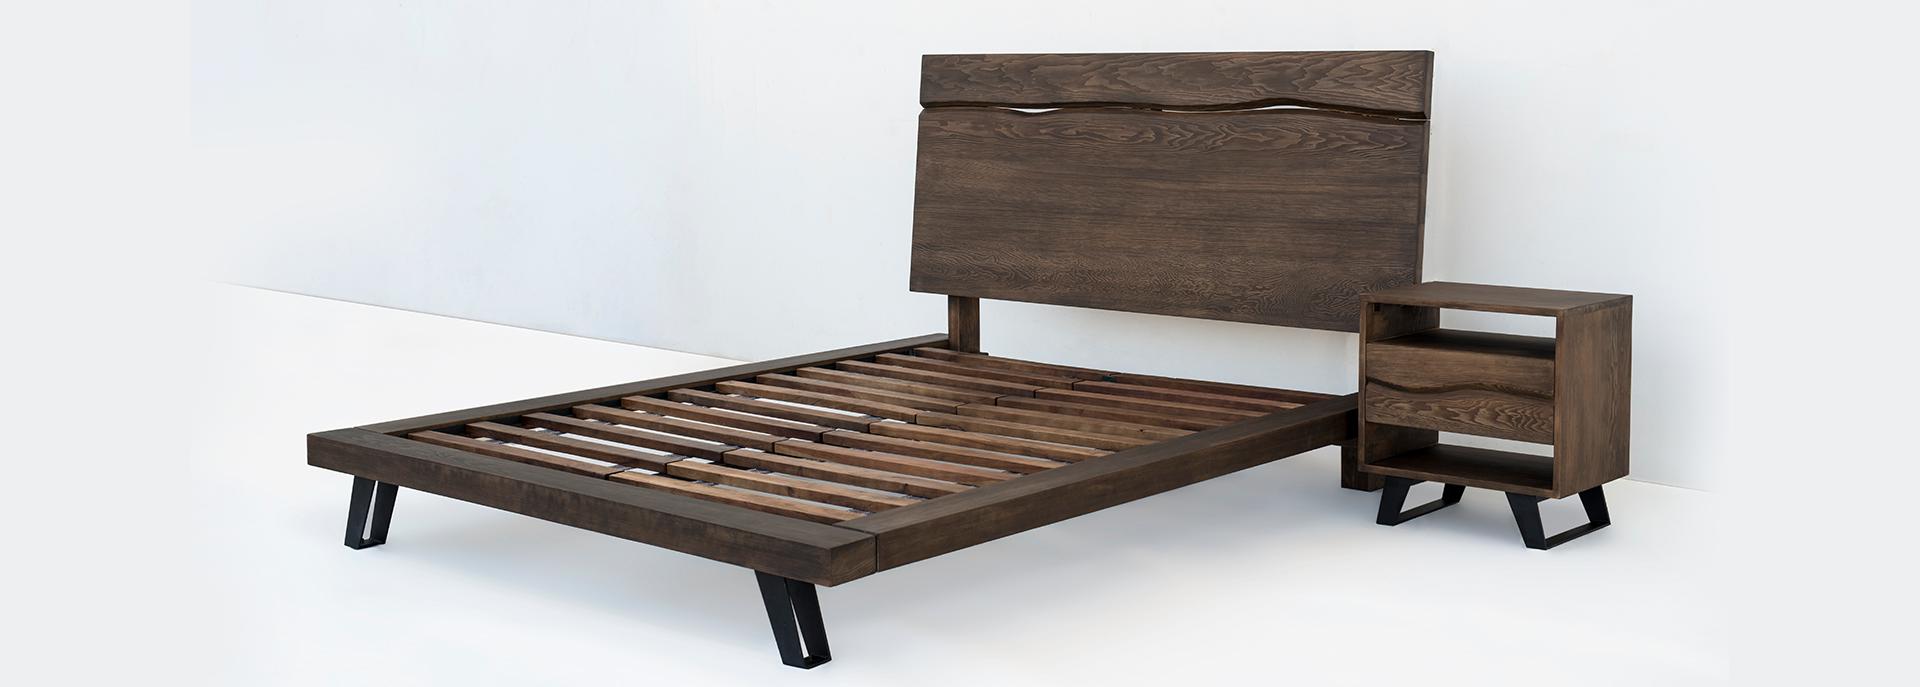 Furniture banner 3 - Canadian Wood